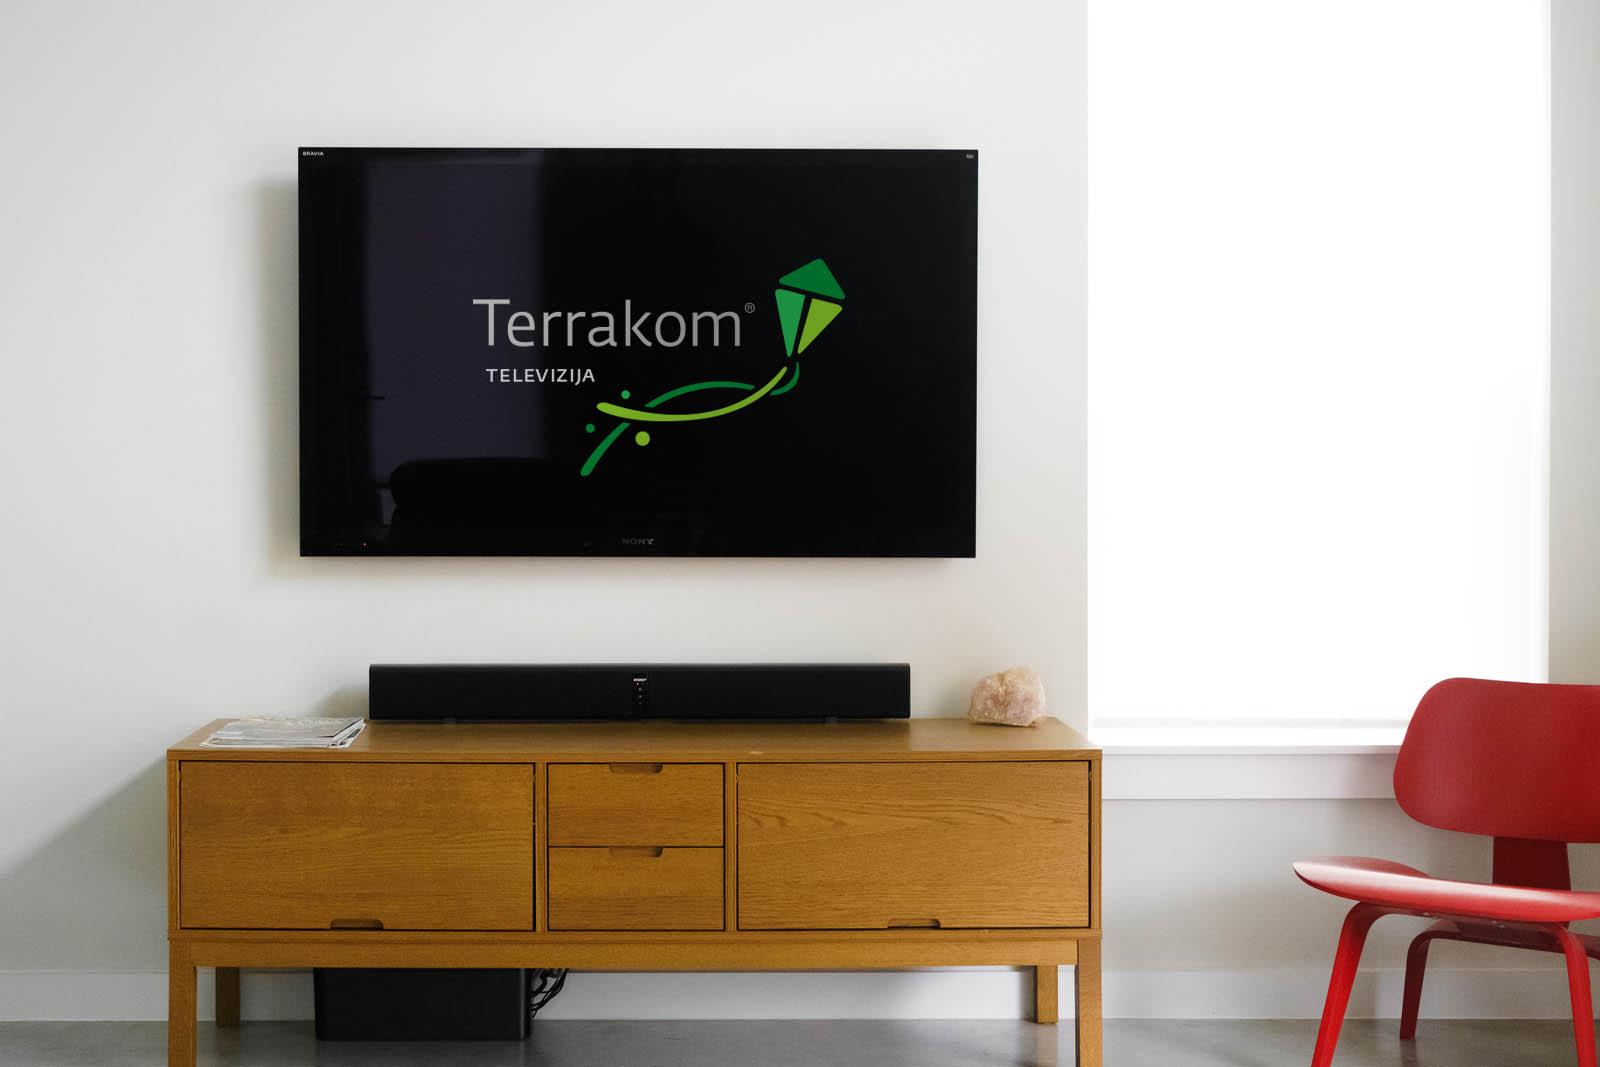 terrakom_tv_room.jpg